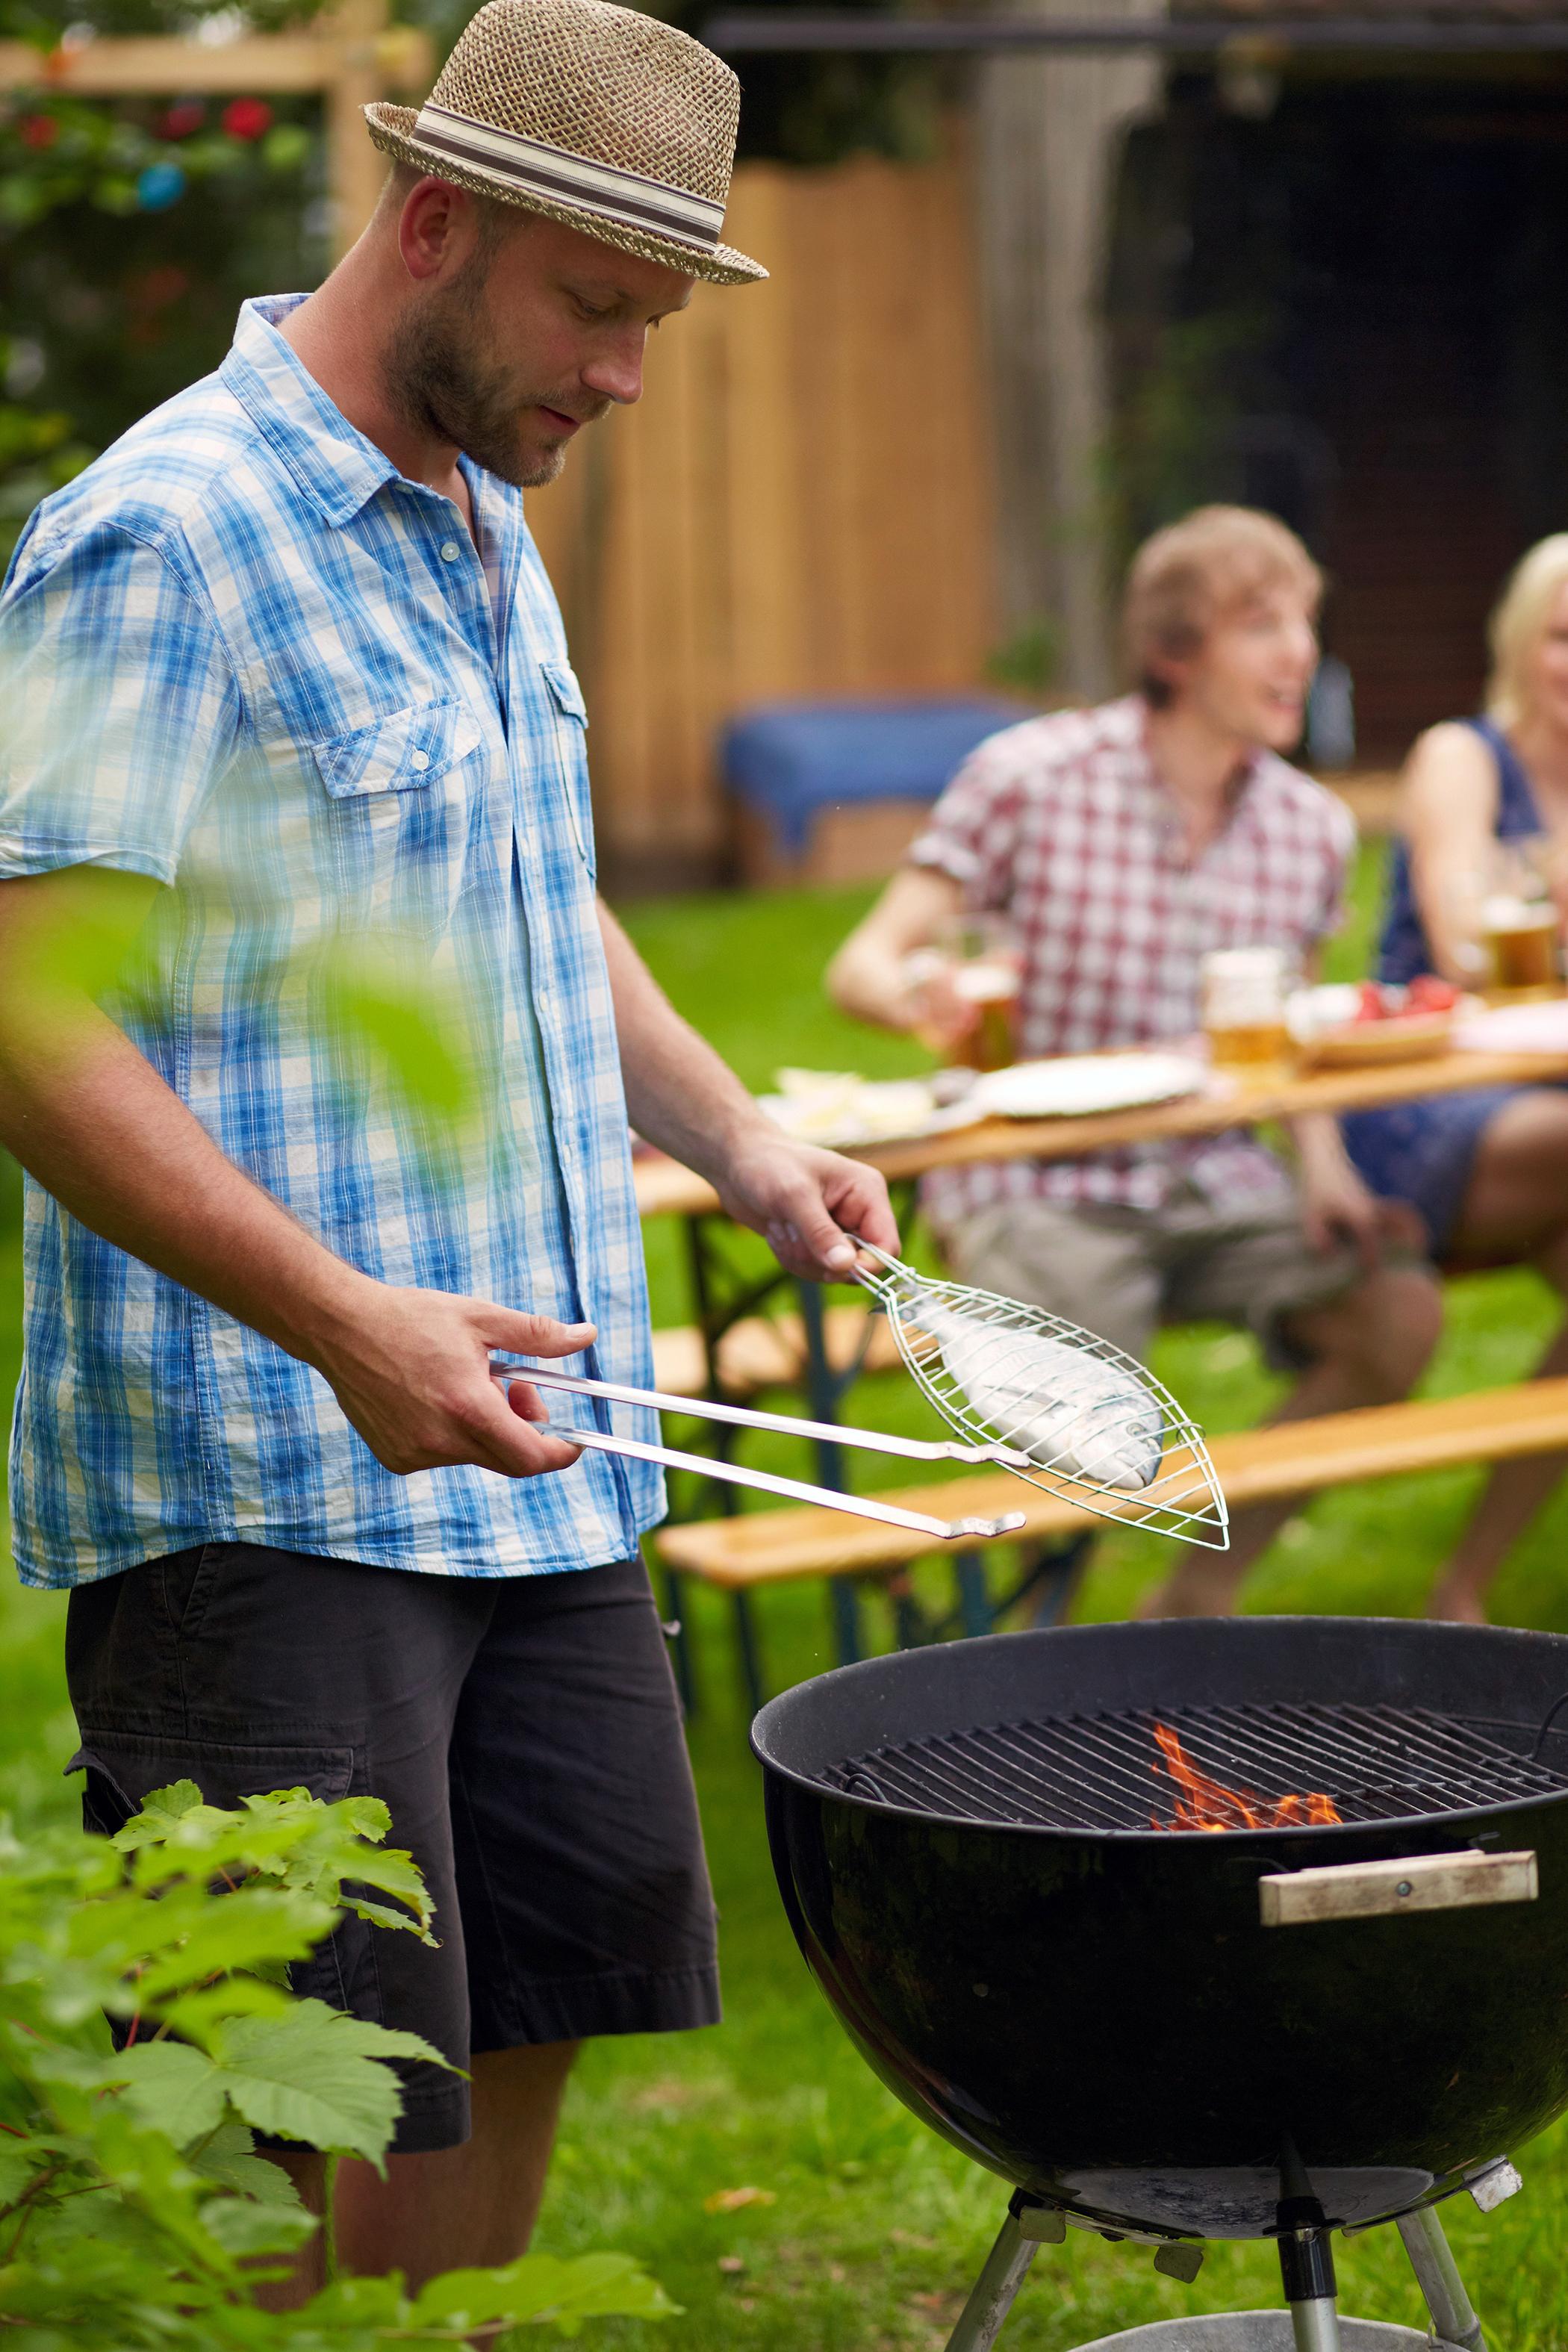 man grilling fish